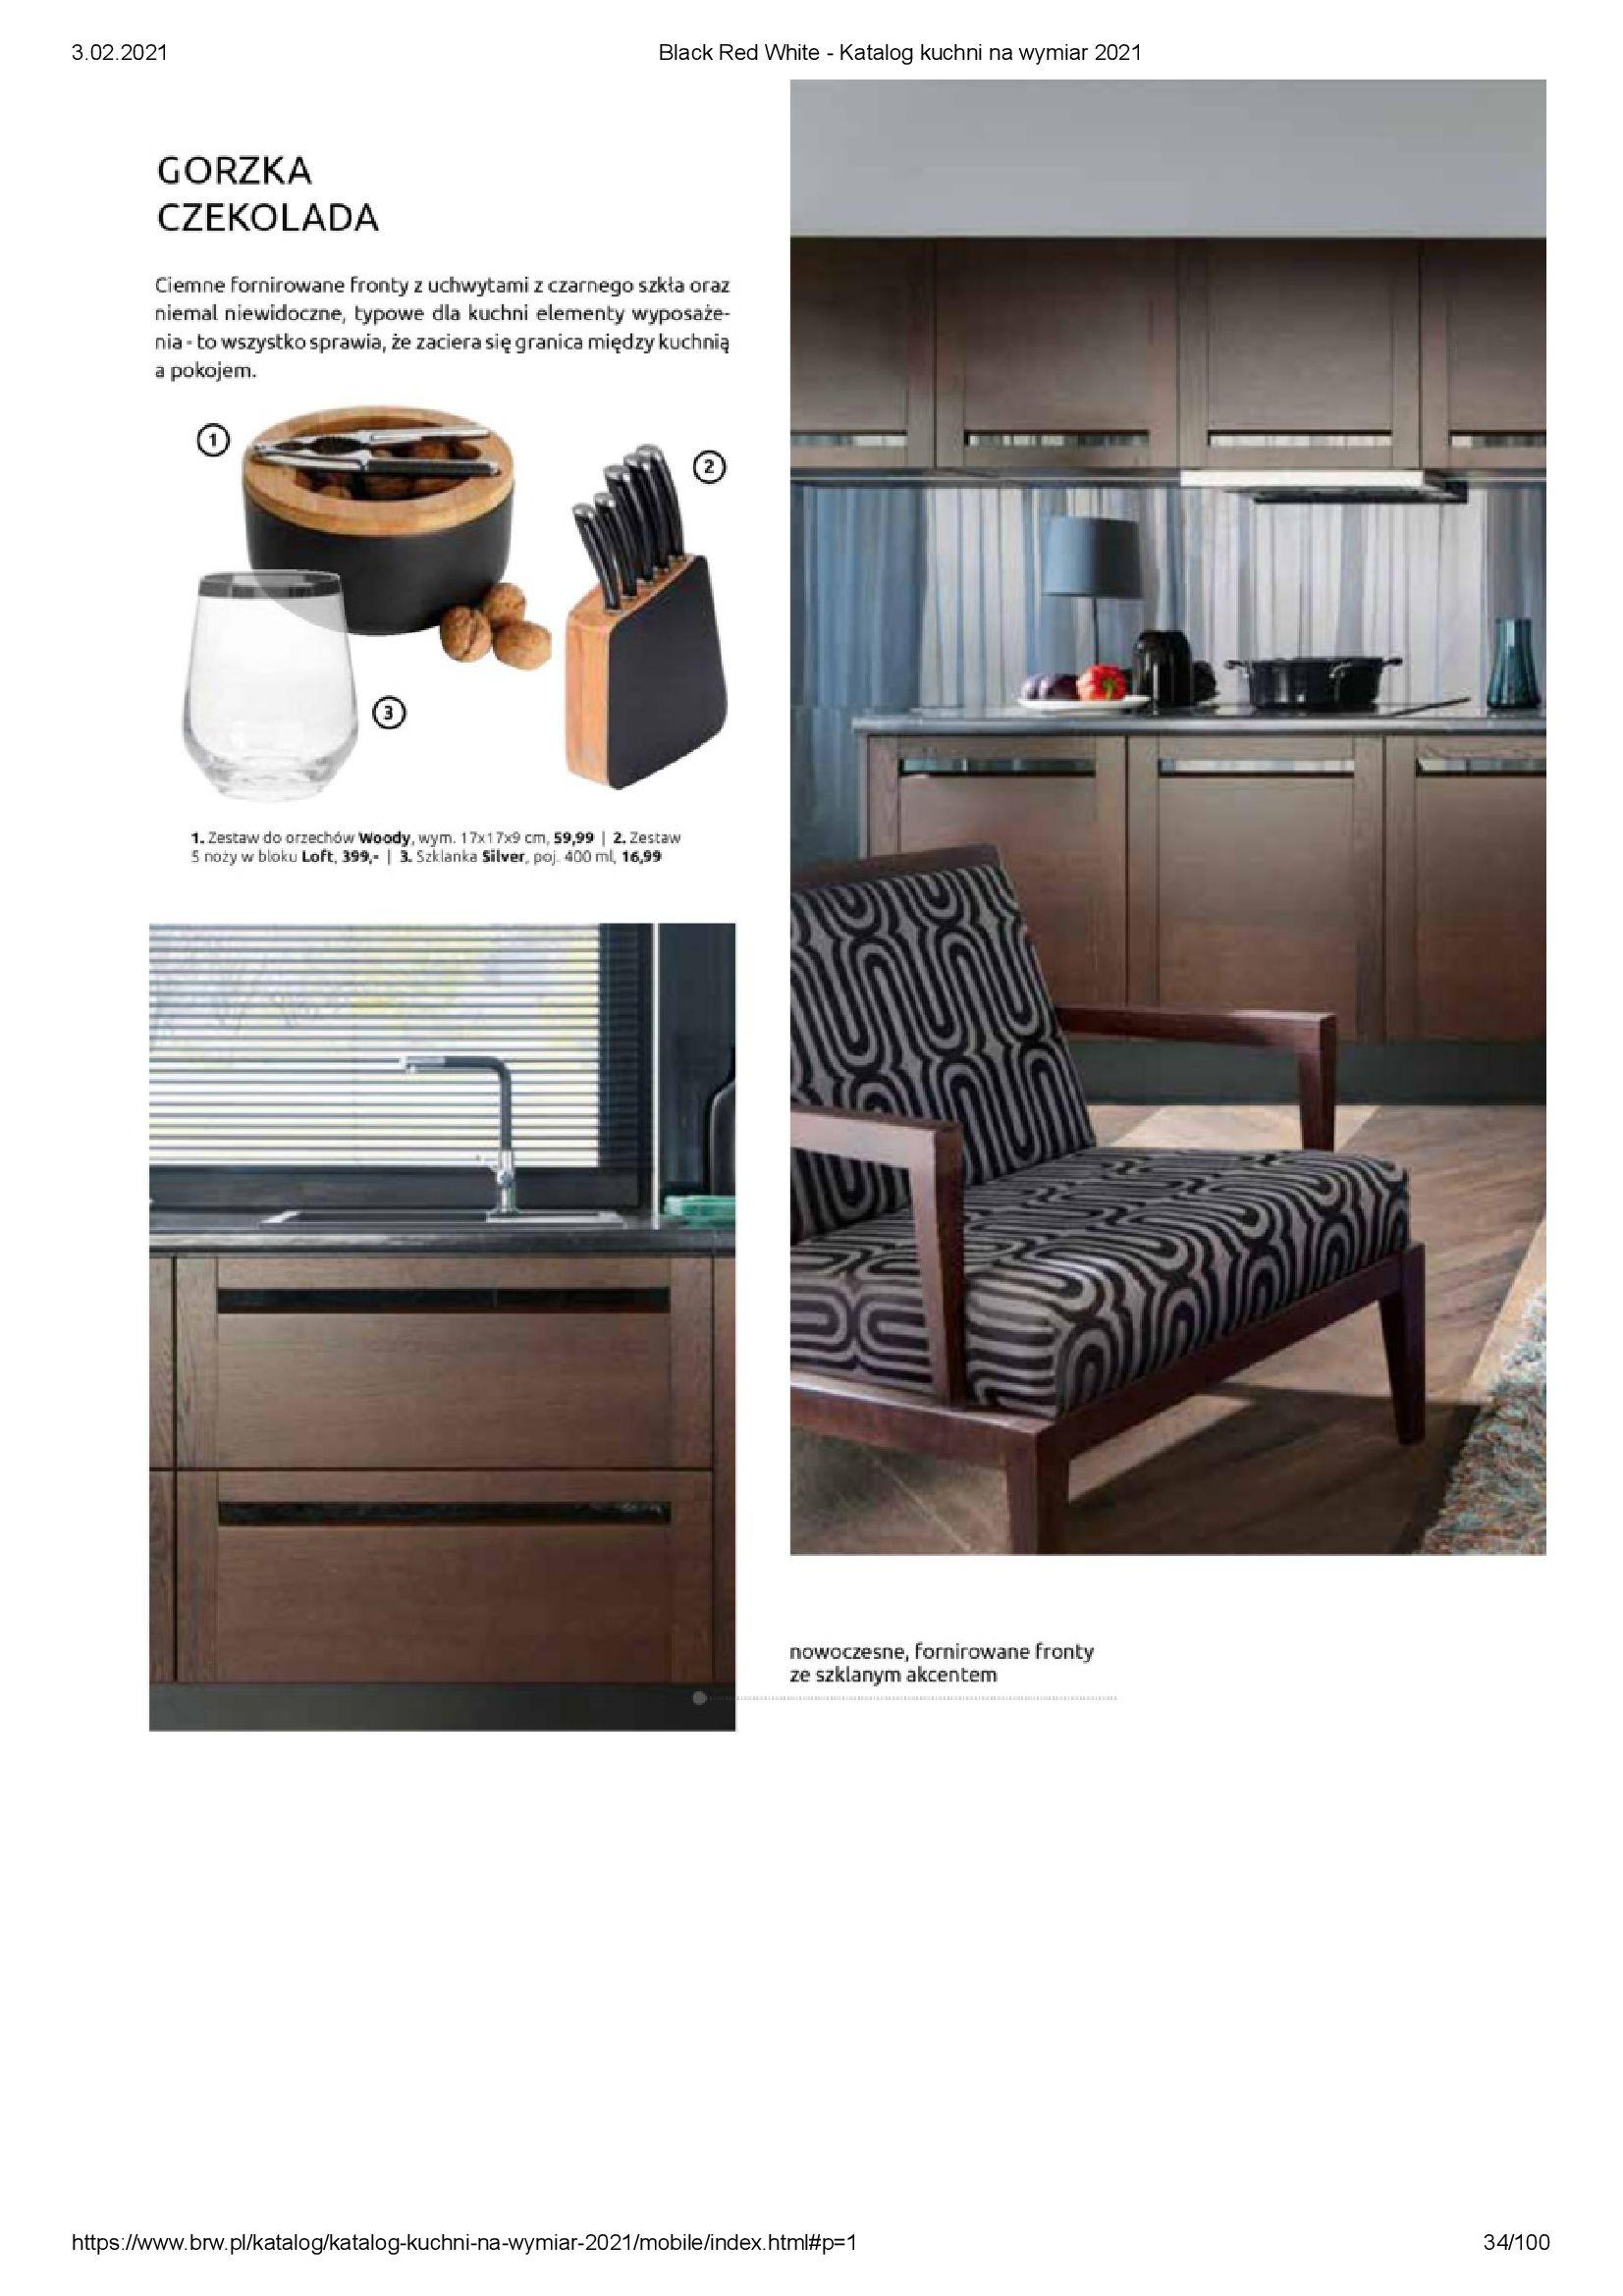 Gazetka Black Red White: Katalog - Kuchnie na wymiar Senso Kitchens 2021 2021-01-01 page-34